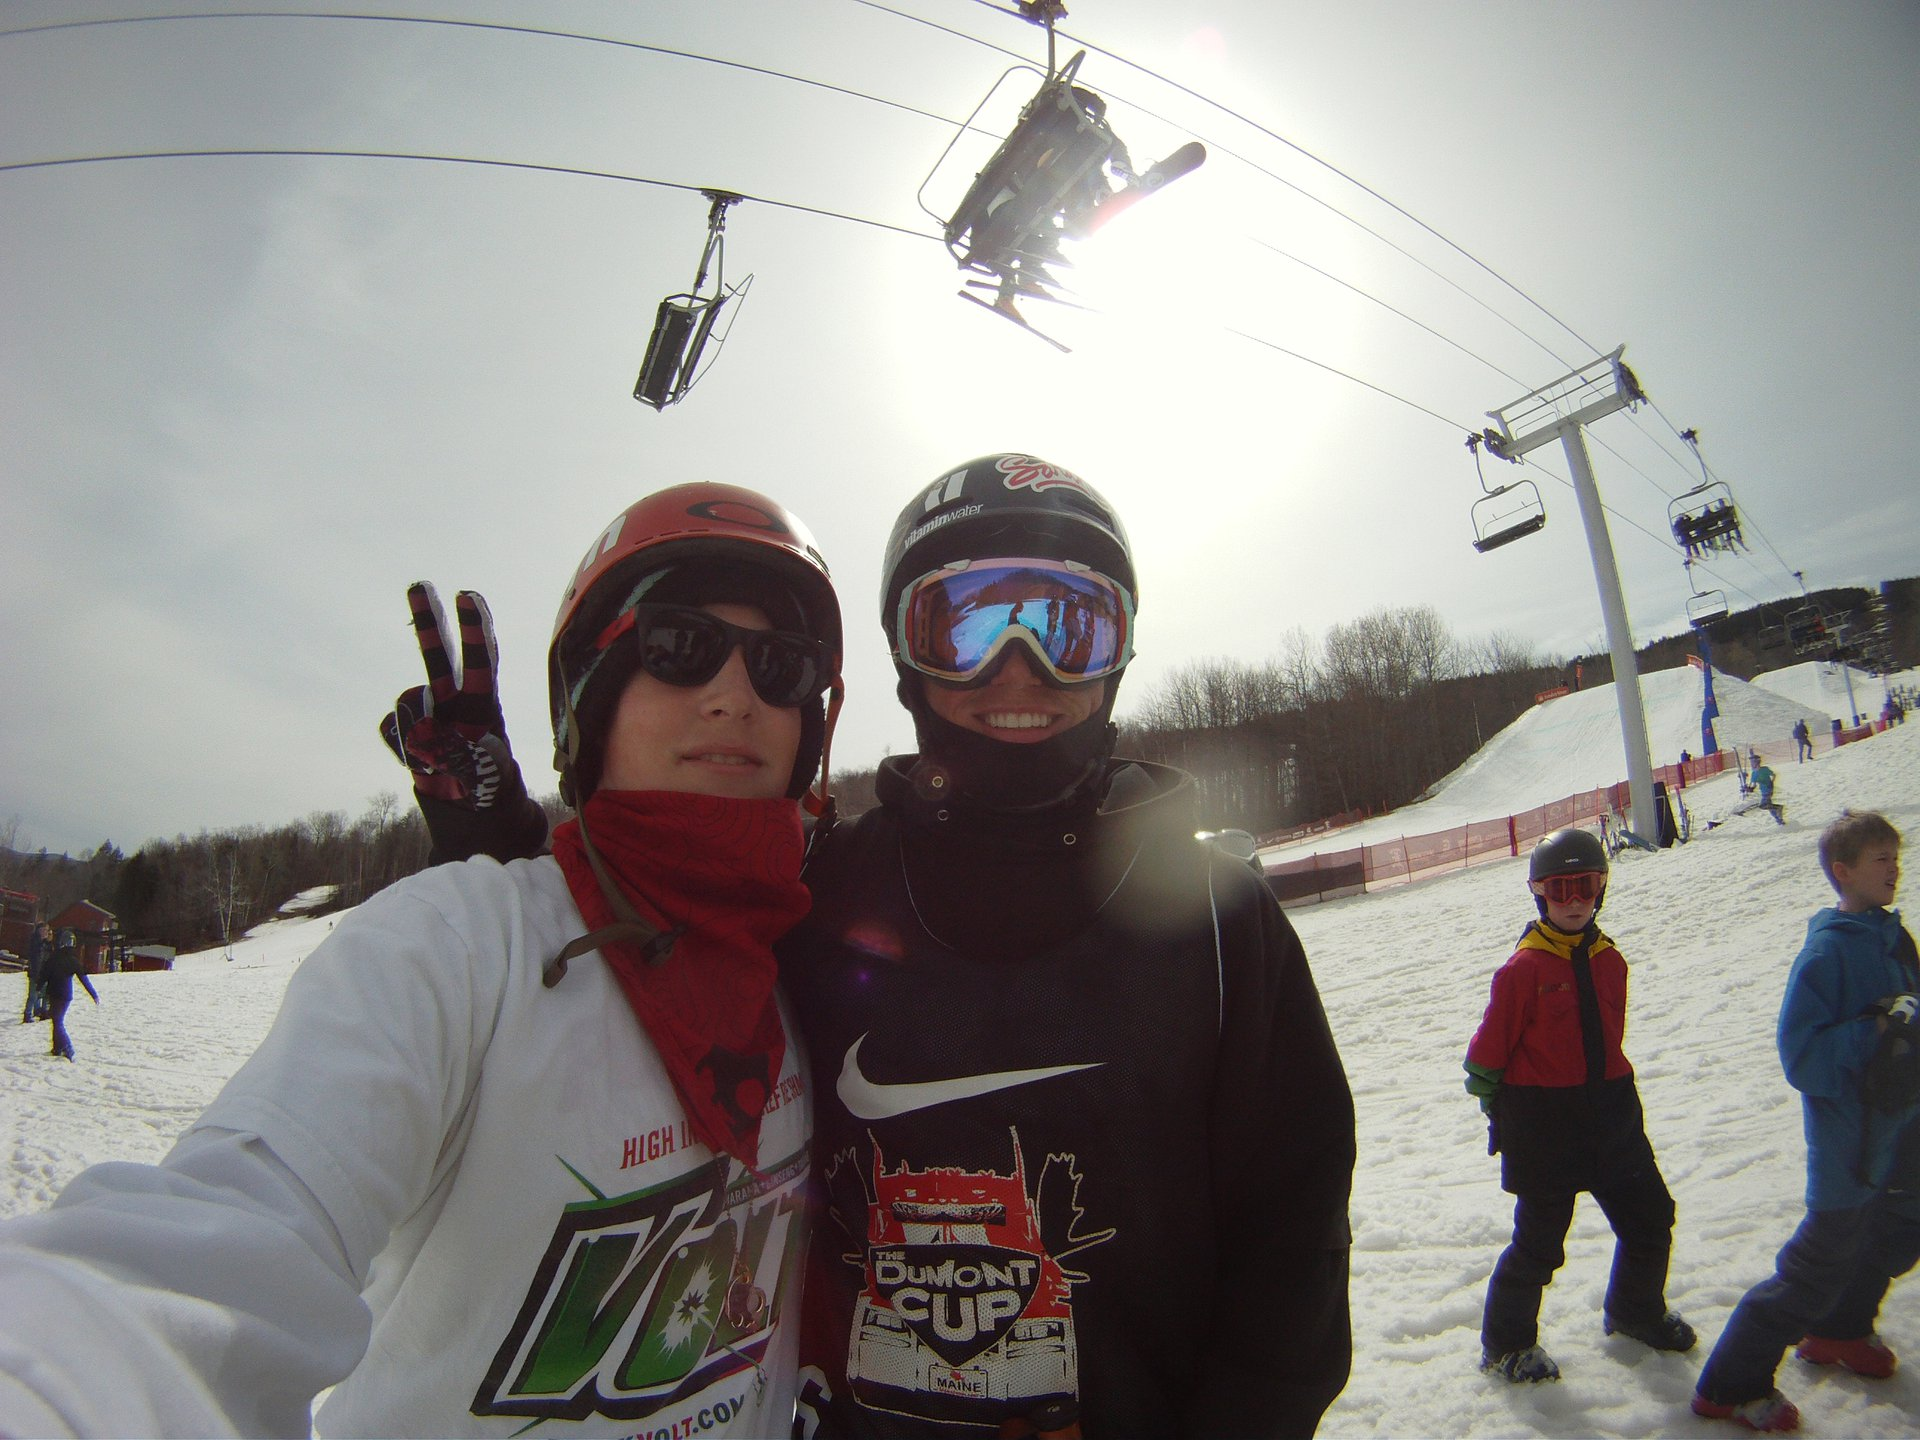 me and gus kenworthy